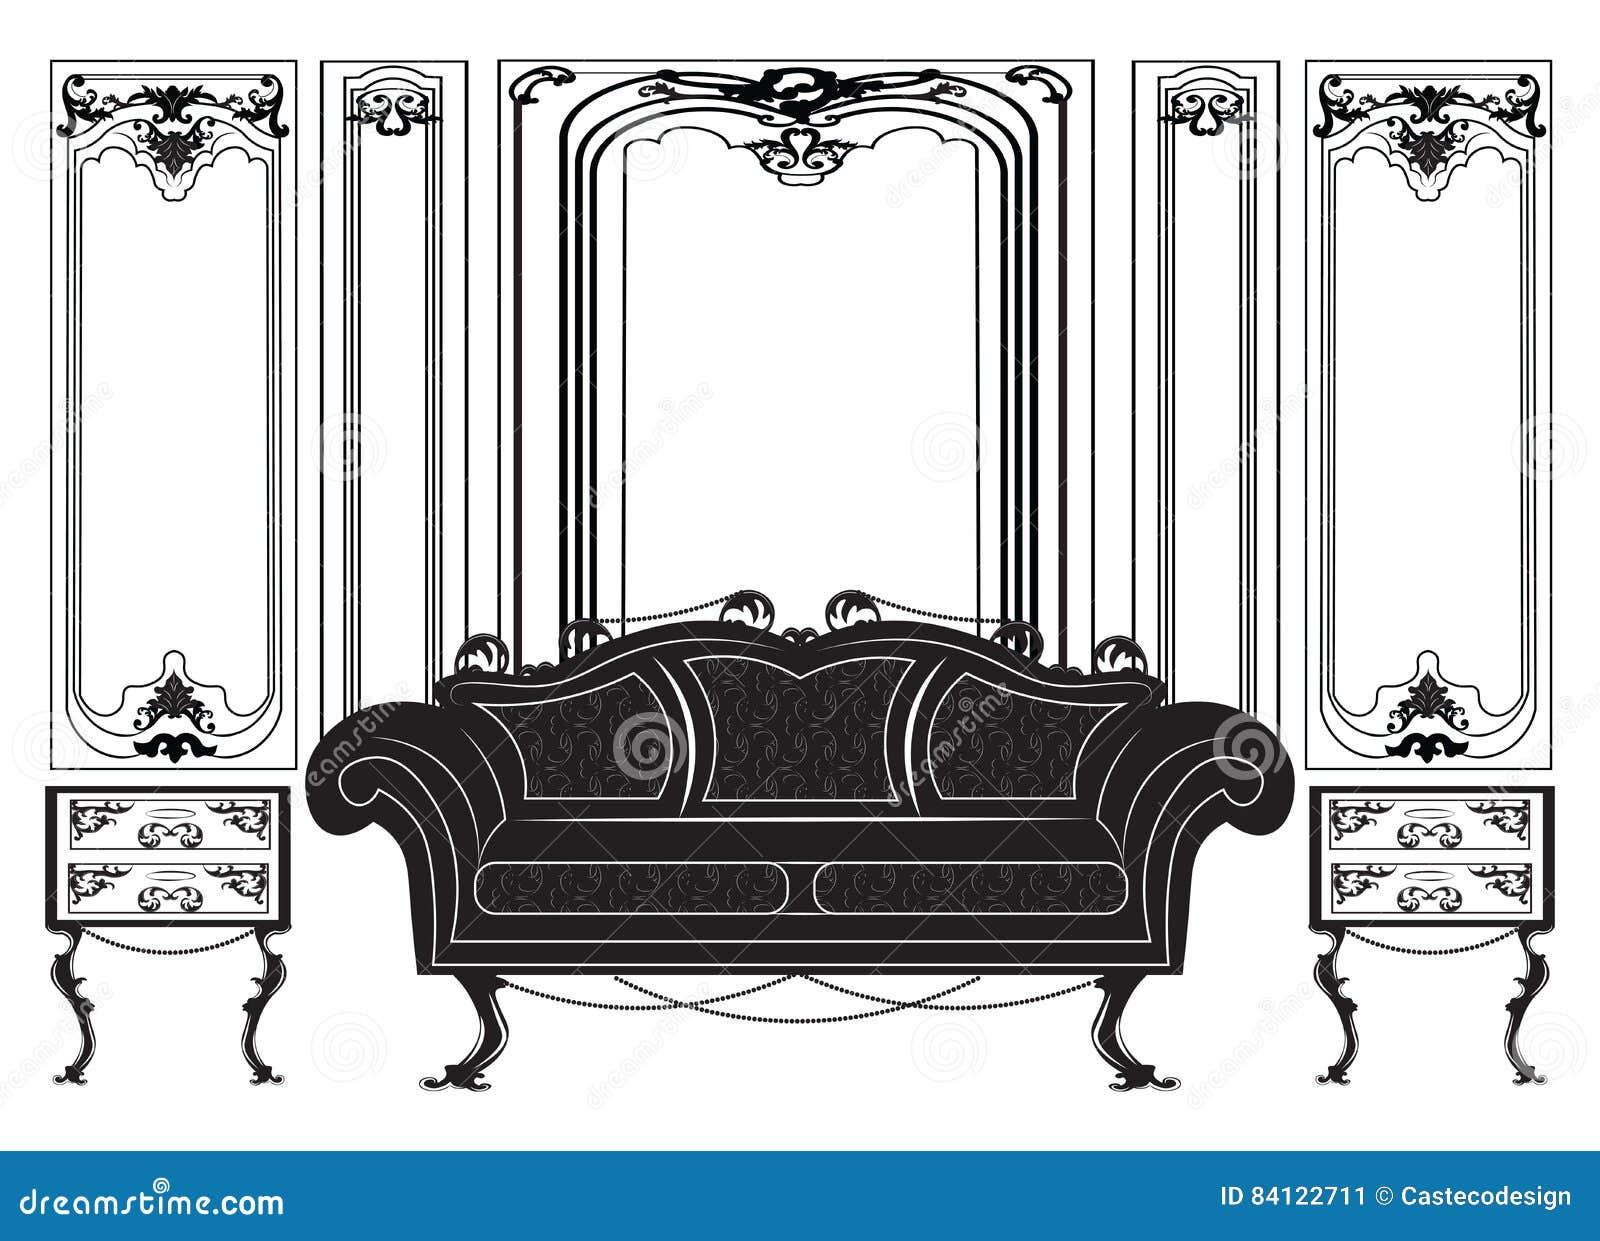 Vintage Gothic Style Furniture Set Stock Vector - Illustration of ...